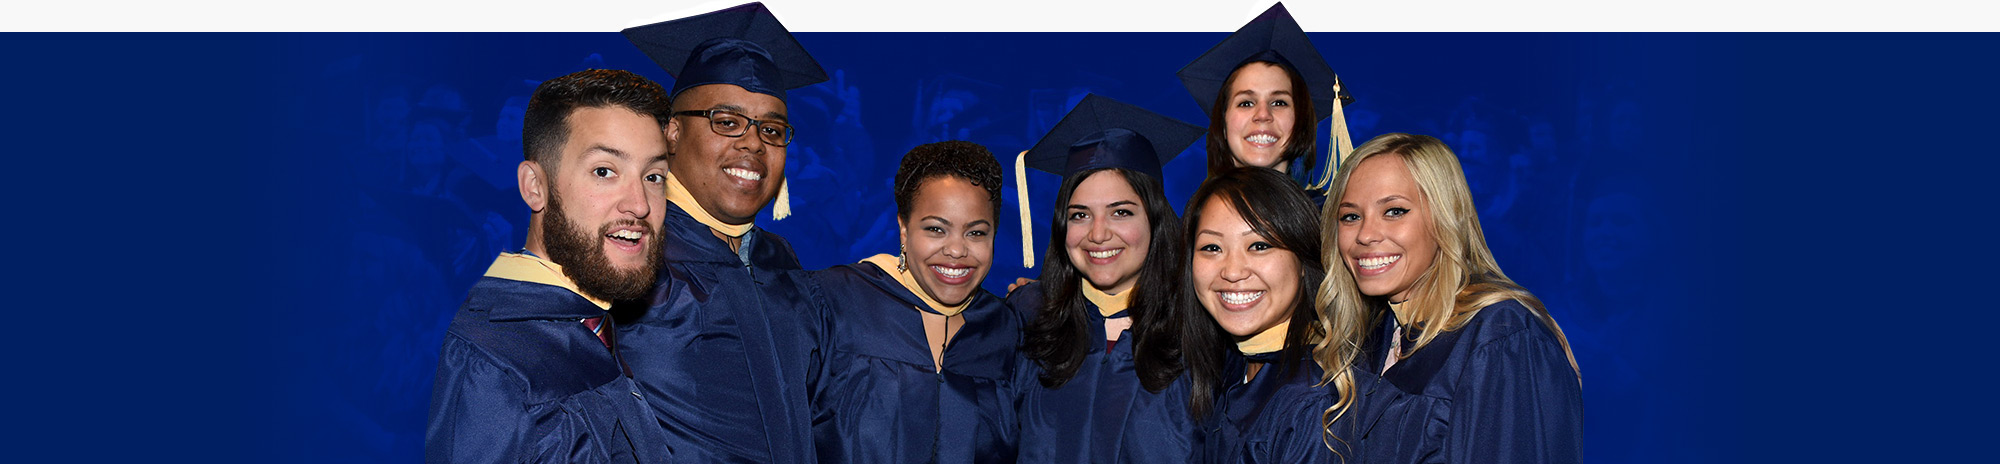 Jane Addams graduates